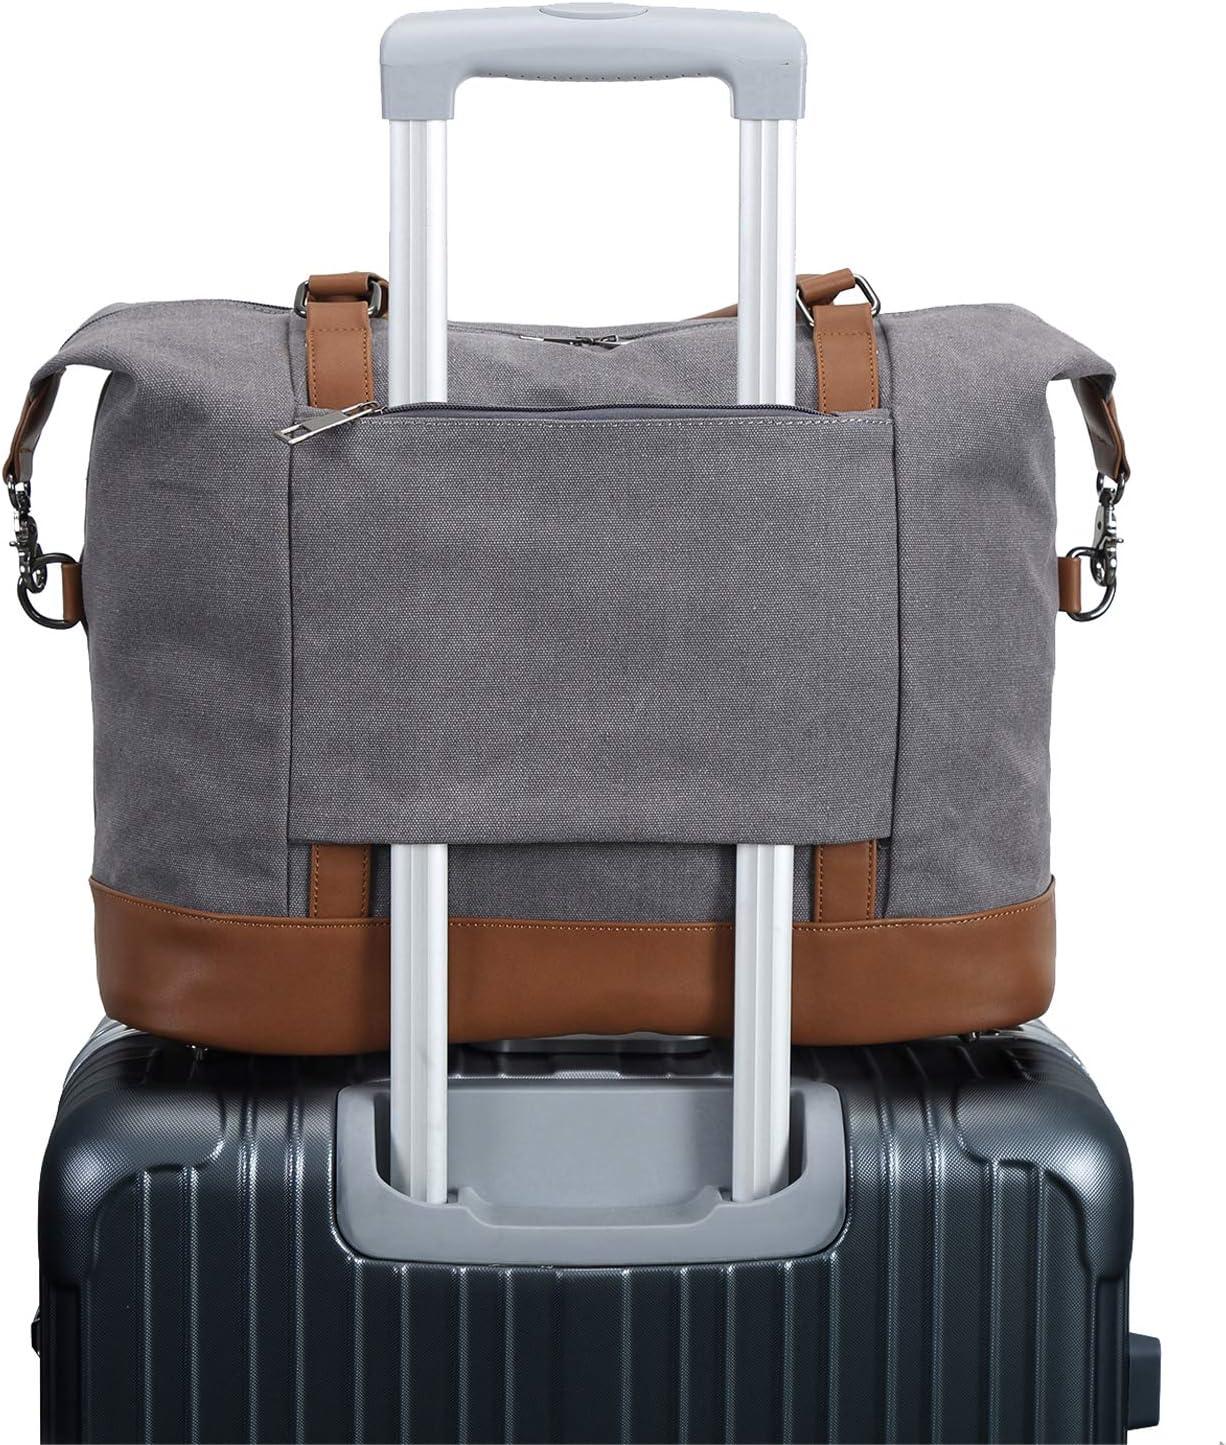 Sky Travel Carry-on Luggage Weekender Bag Overnight Tote Flight Duffel In Trolley Handle